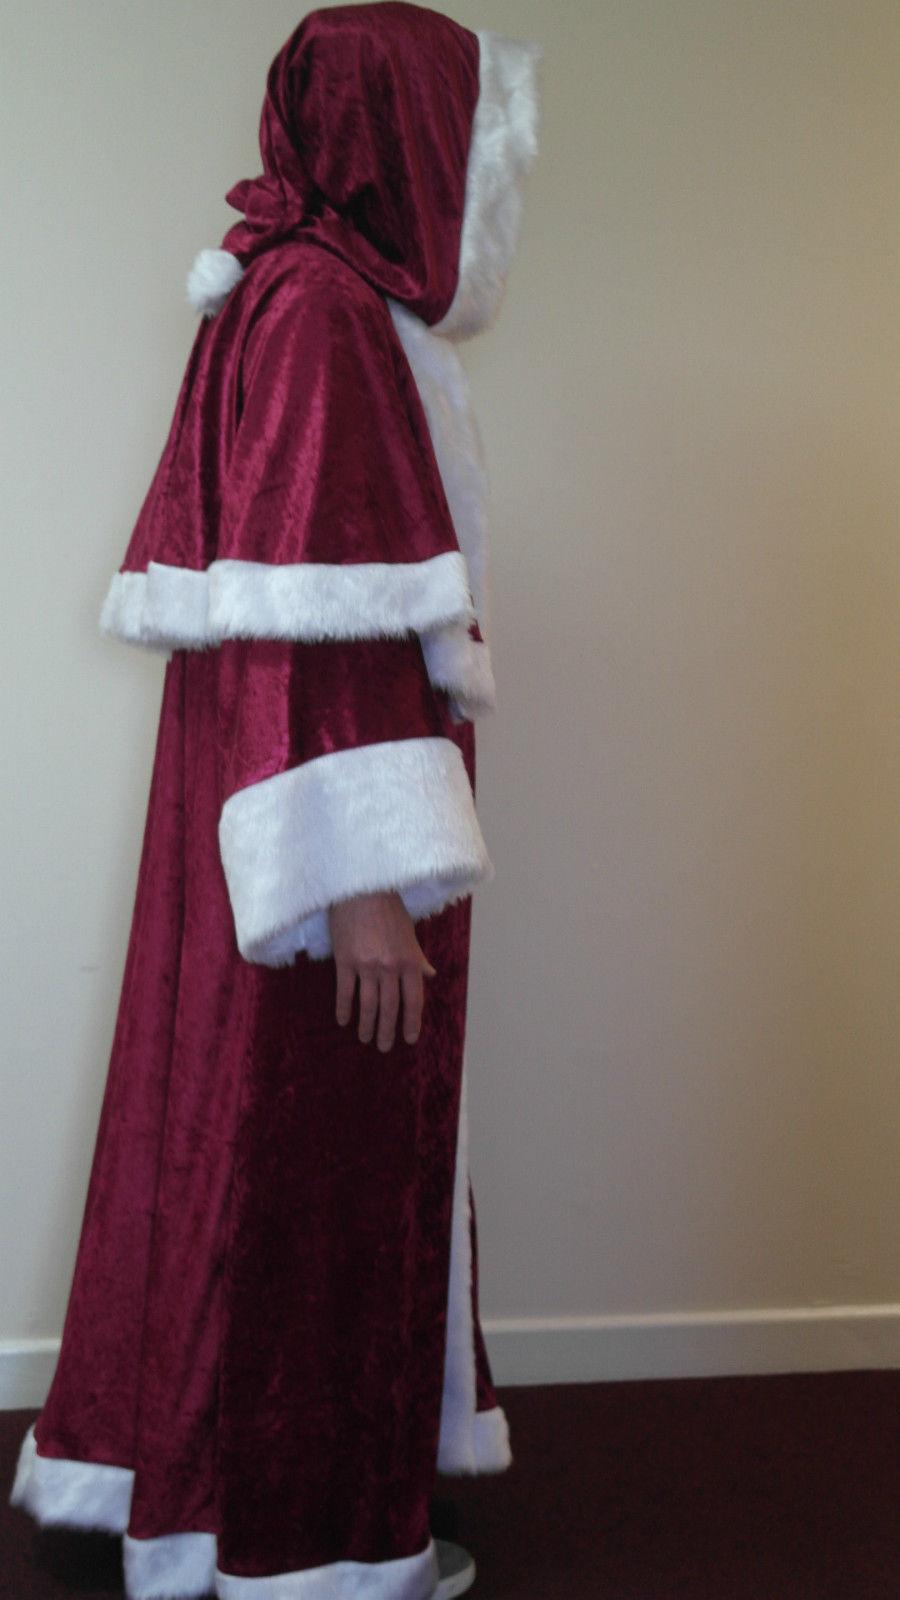 53f8b5ee88 Father Christmas Pull-on Velvet Robe Santa clause St. Nicholas ...